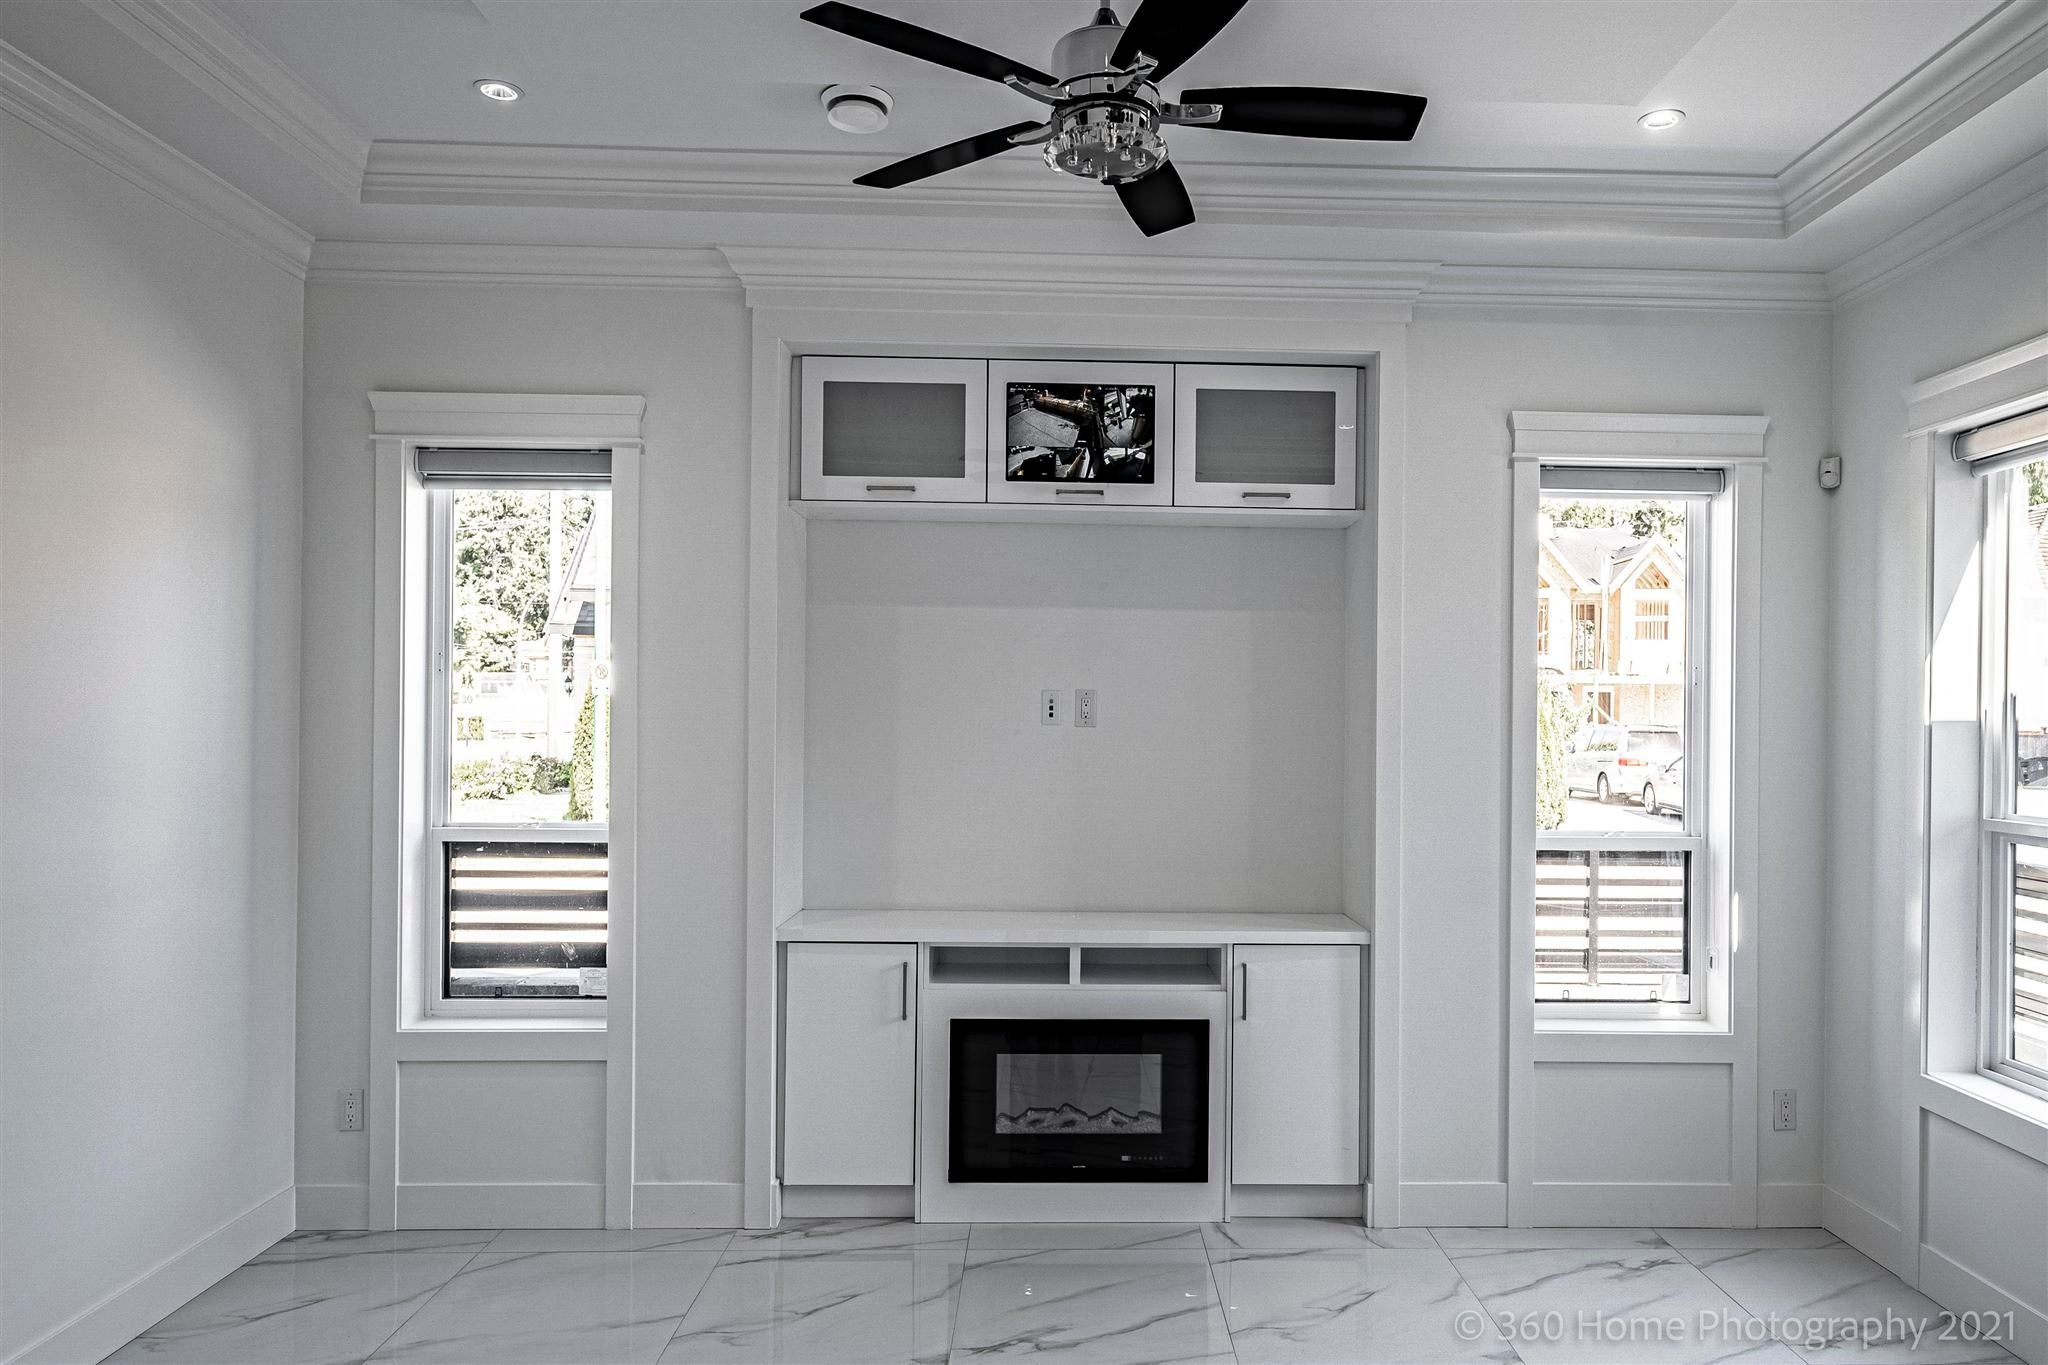 13050 101B AVENUE - Cedar Hills House/Single Family for sale, 5 Bedrooms (R2602208) - #9